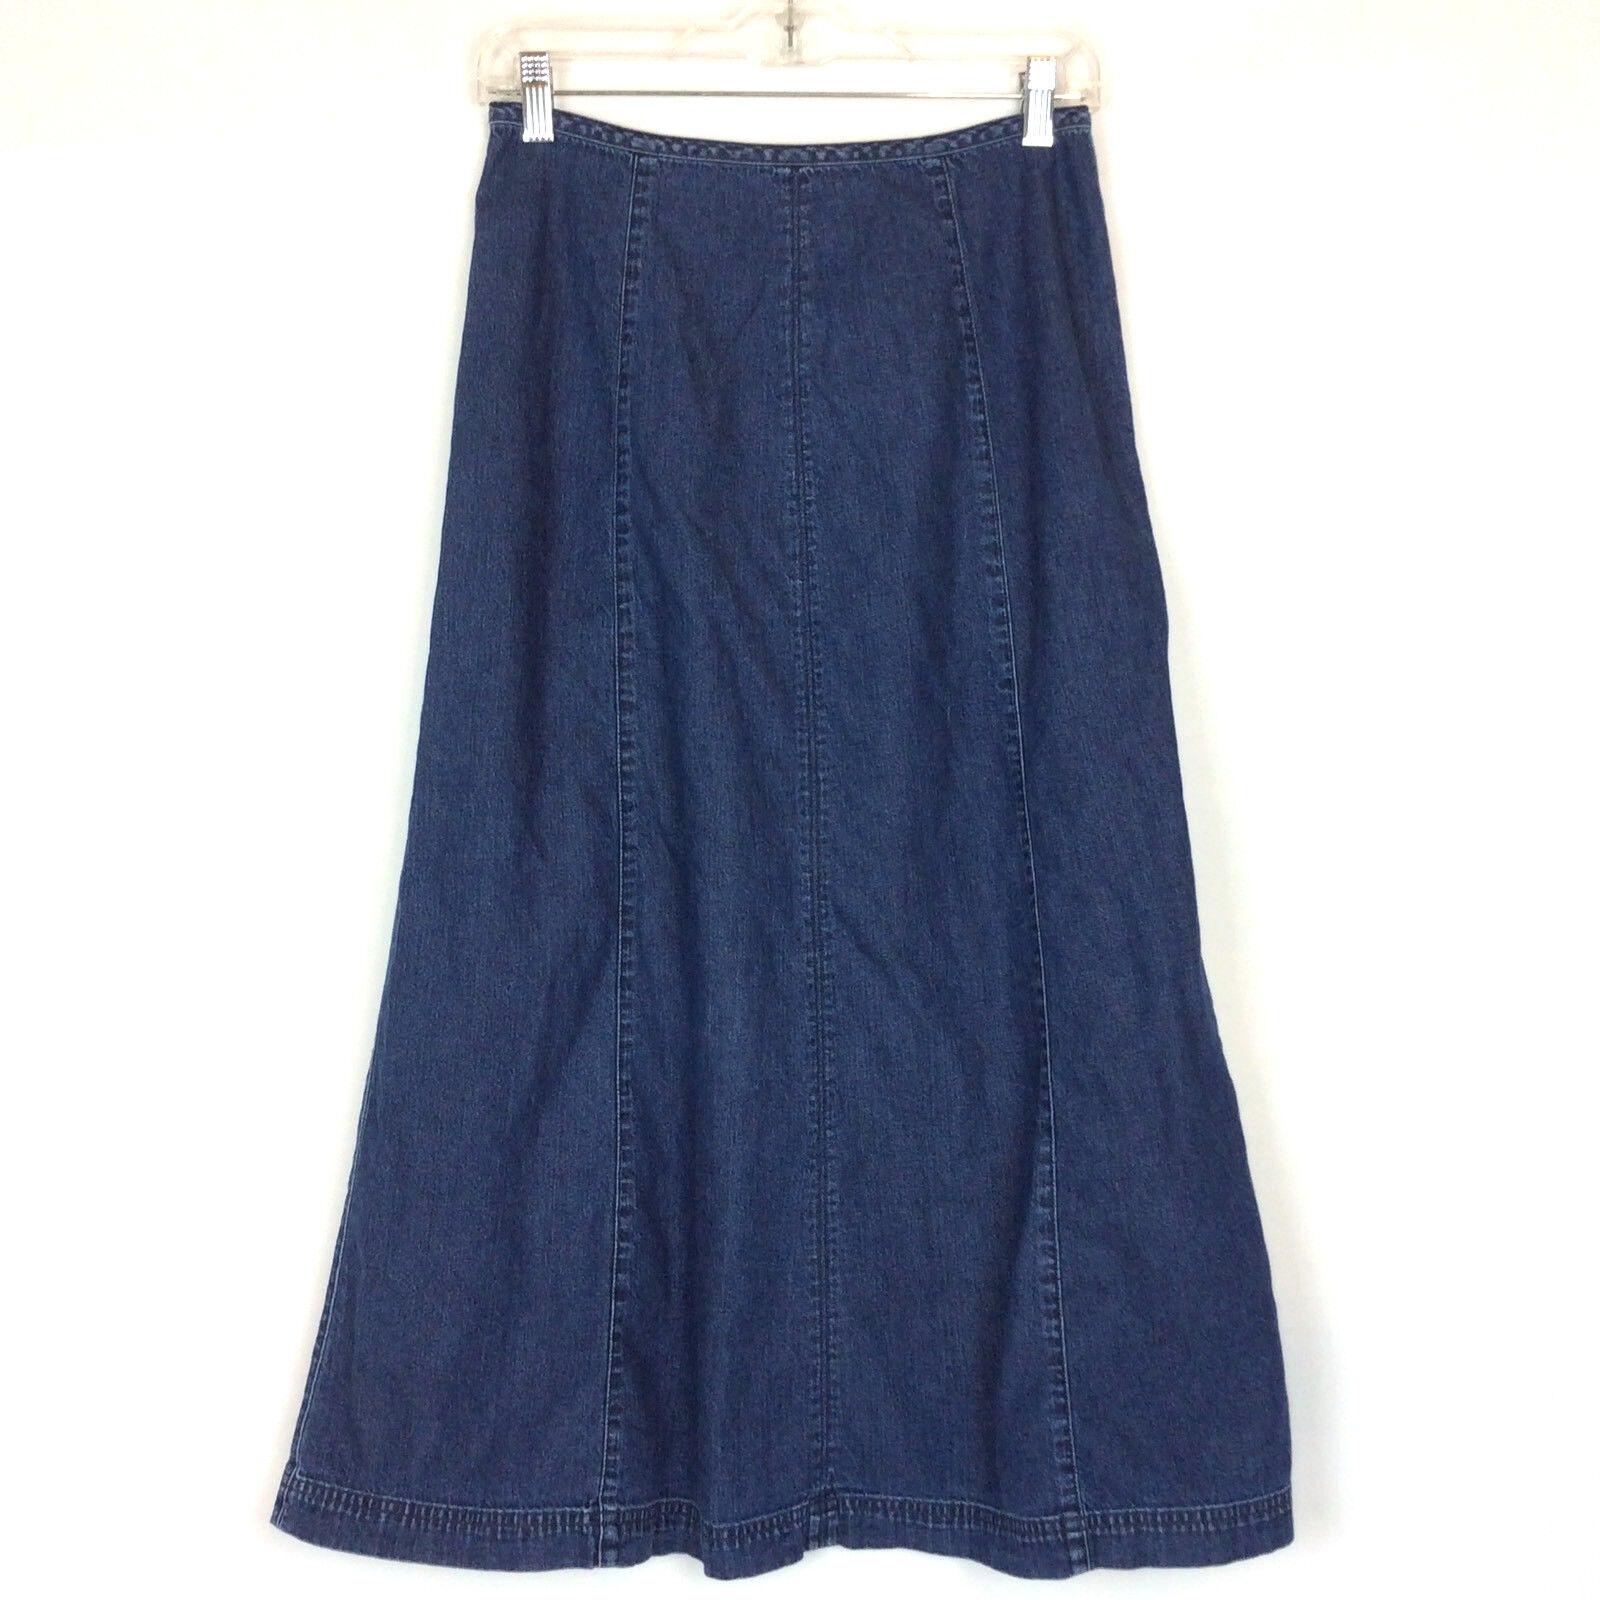 Lizwear Jeans Skirt Size 6 Dark bluee Denim A-Line Modest Mid Calf Liz Claiborne